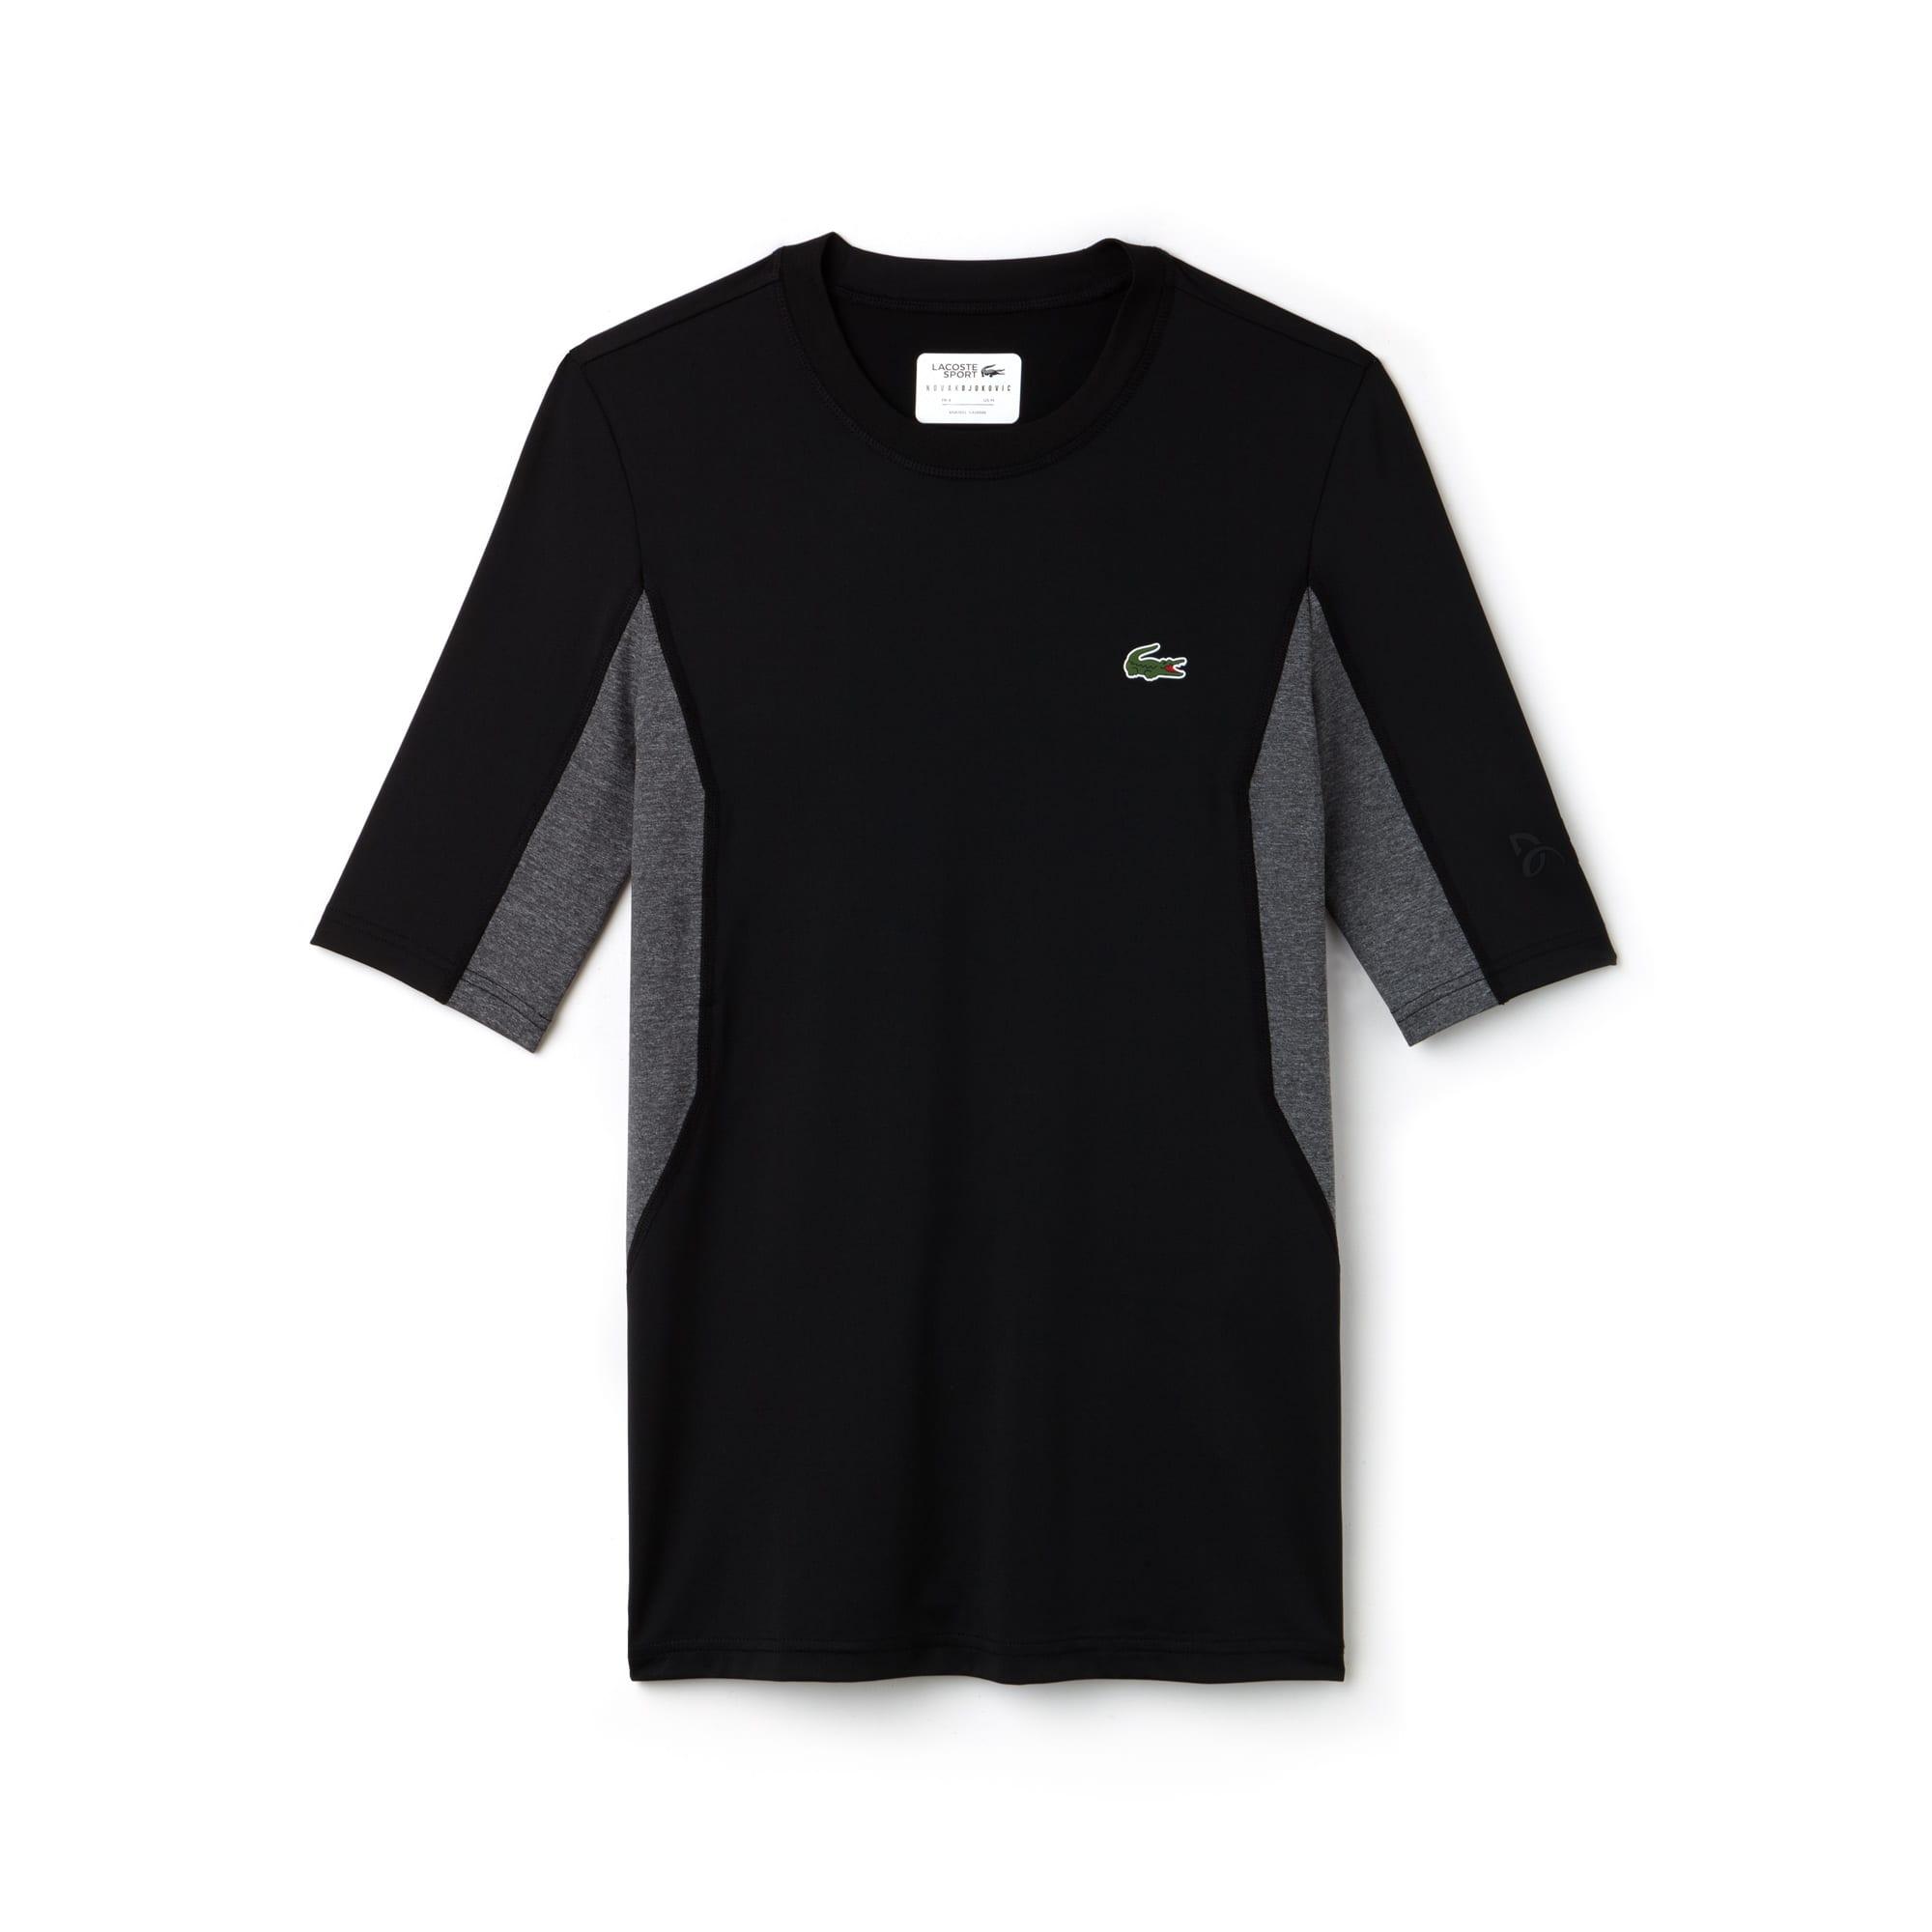 a75f1ac9 Men's SPORT Crew Neck Stretch Technical Jersey T-shirt - Lacoste x ...